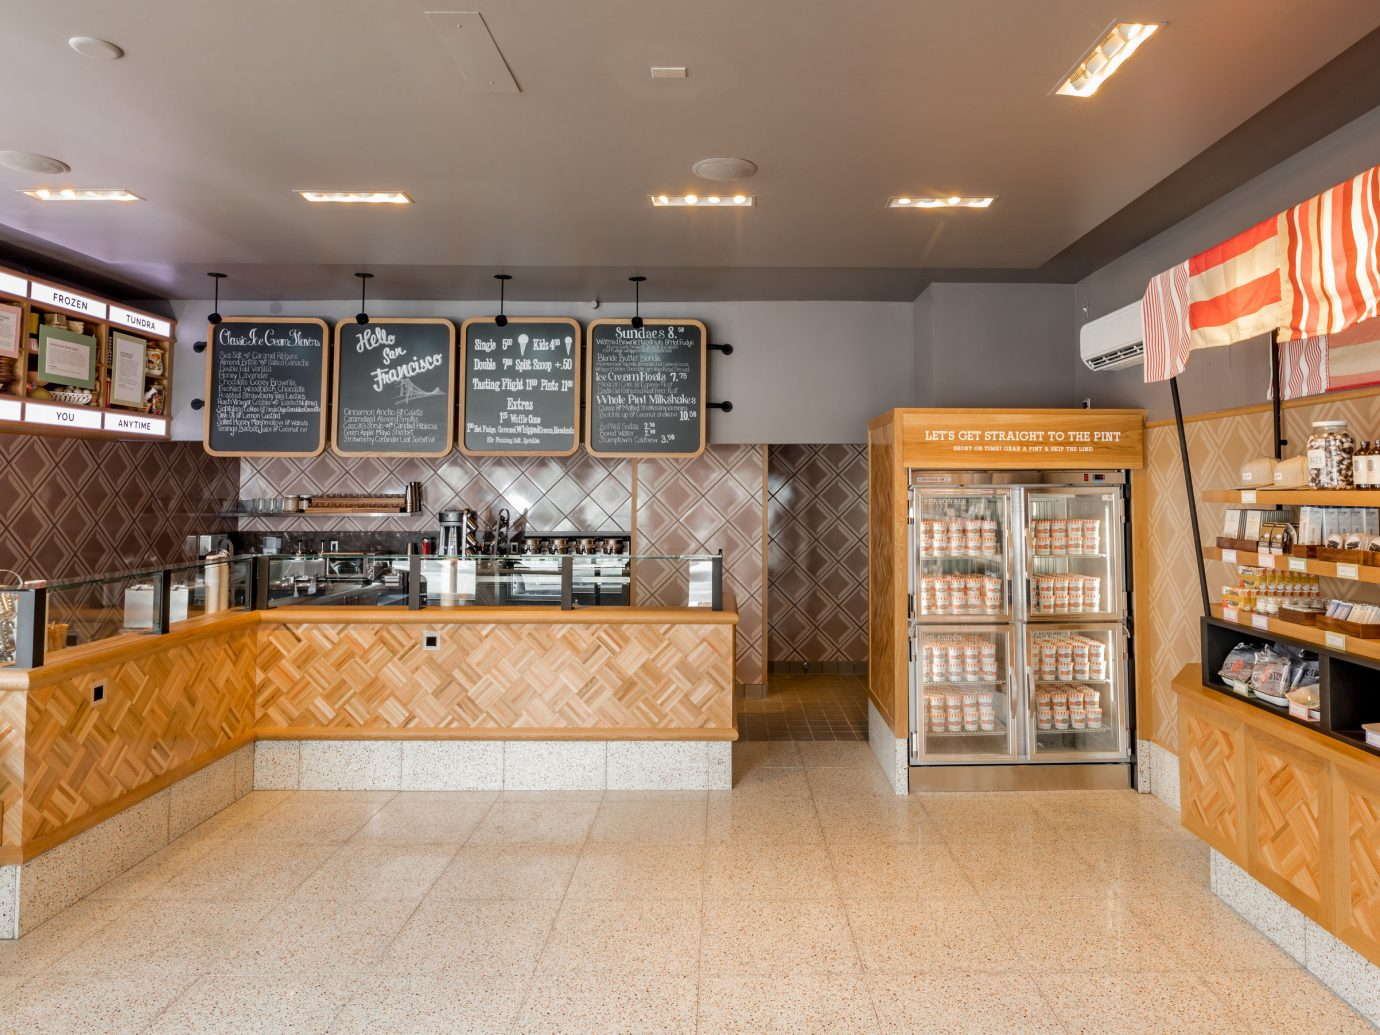 Trip Ideas indoor floor ceiling bakery interior design real estate retail counter flooring Kitchen furniture